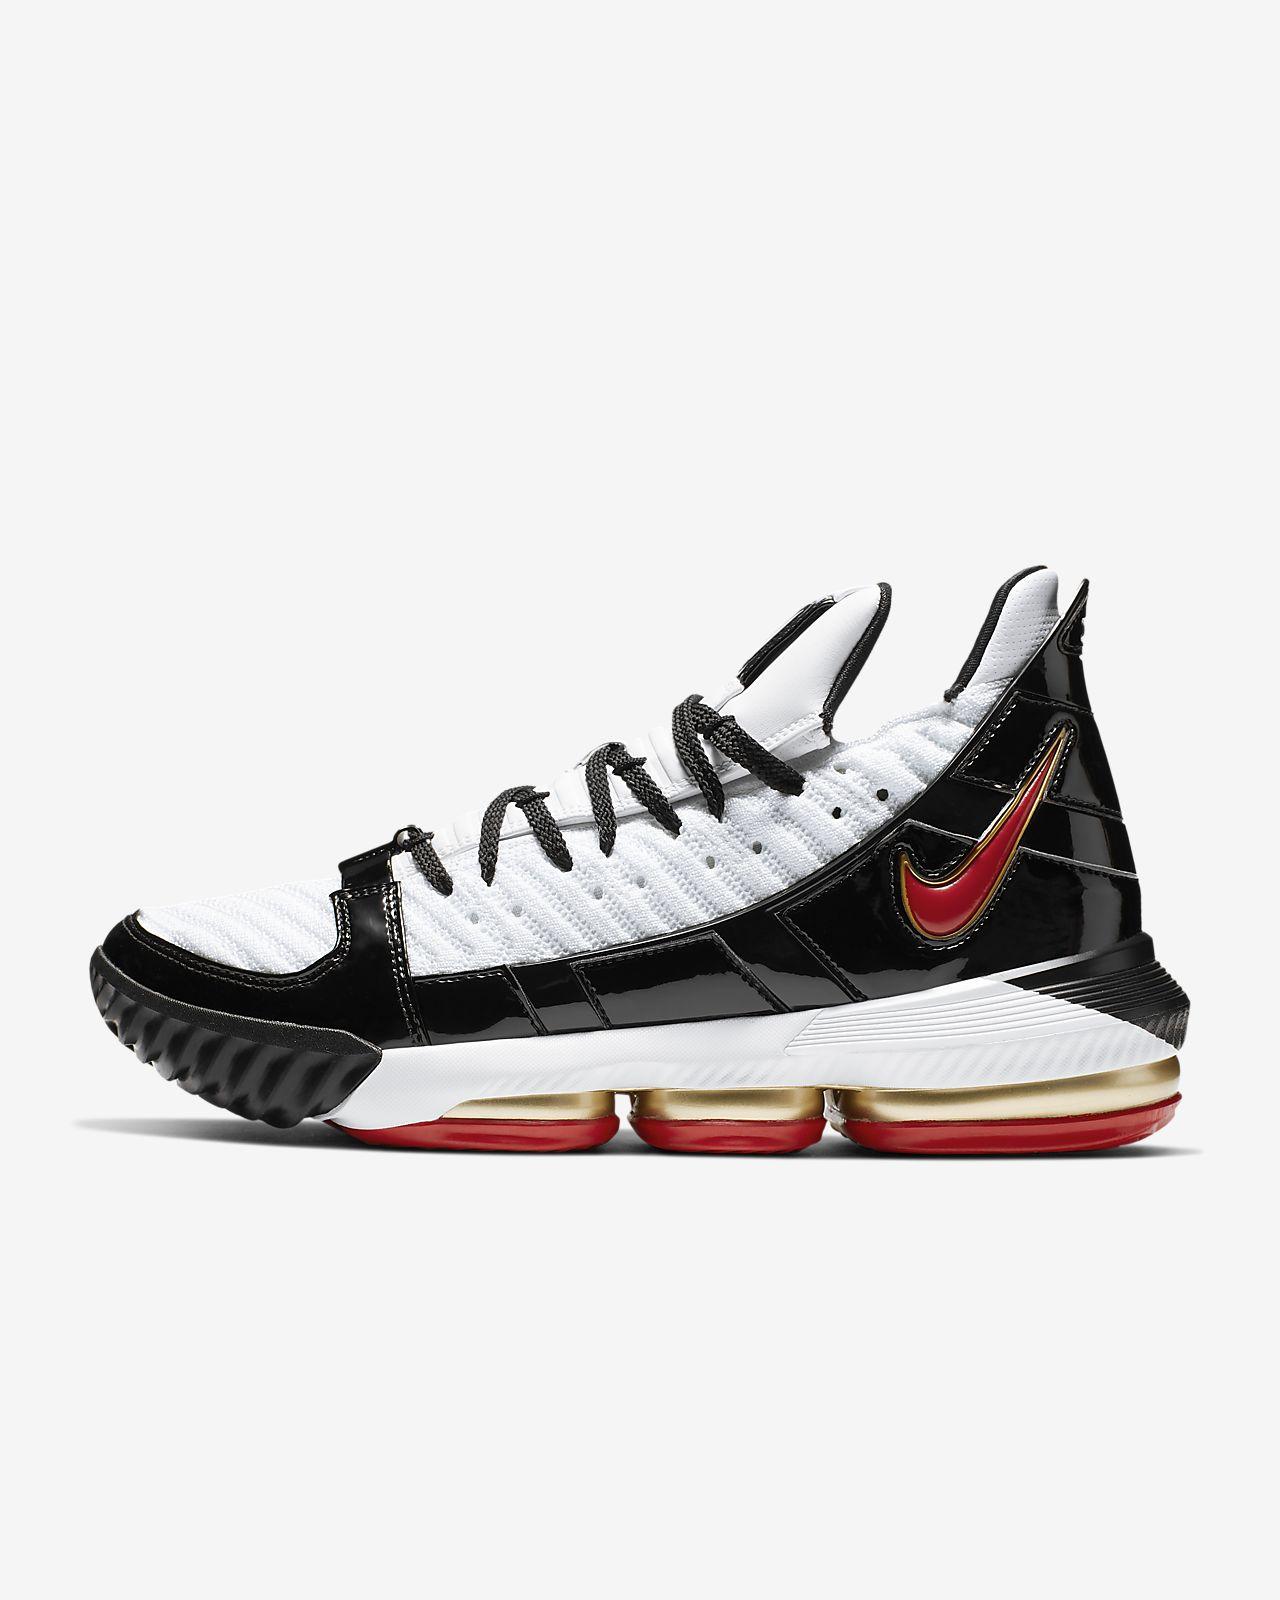 LeBron 16 SB Remix Shoe